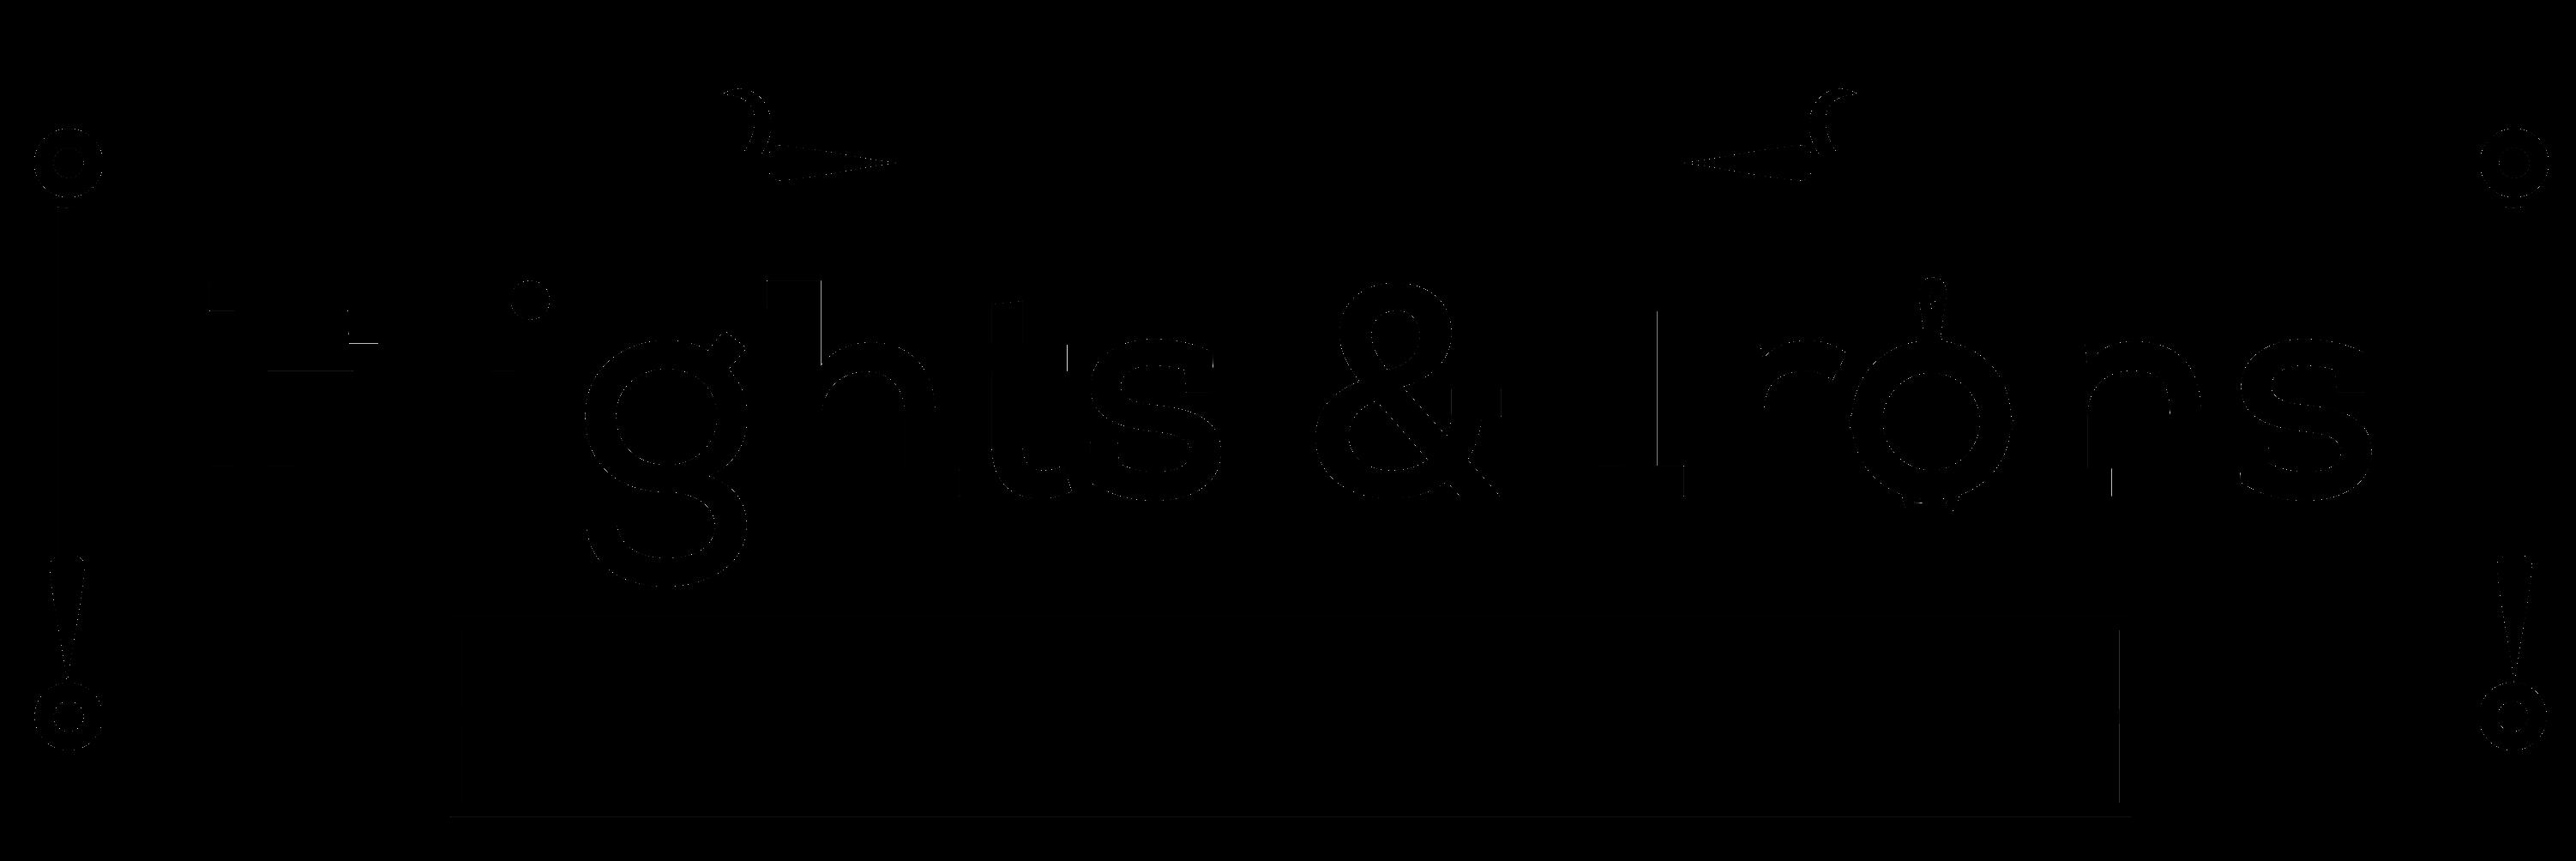 Flights & Irons Urban Kitchen Logo